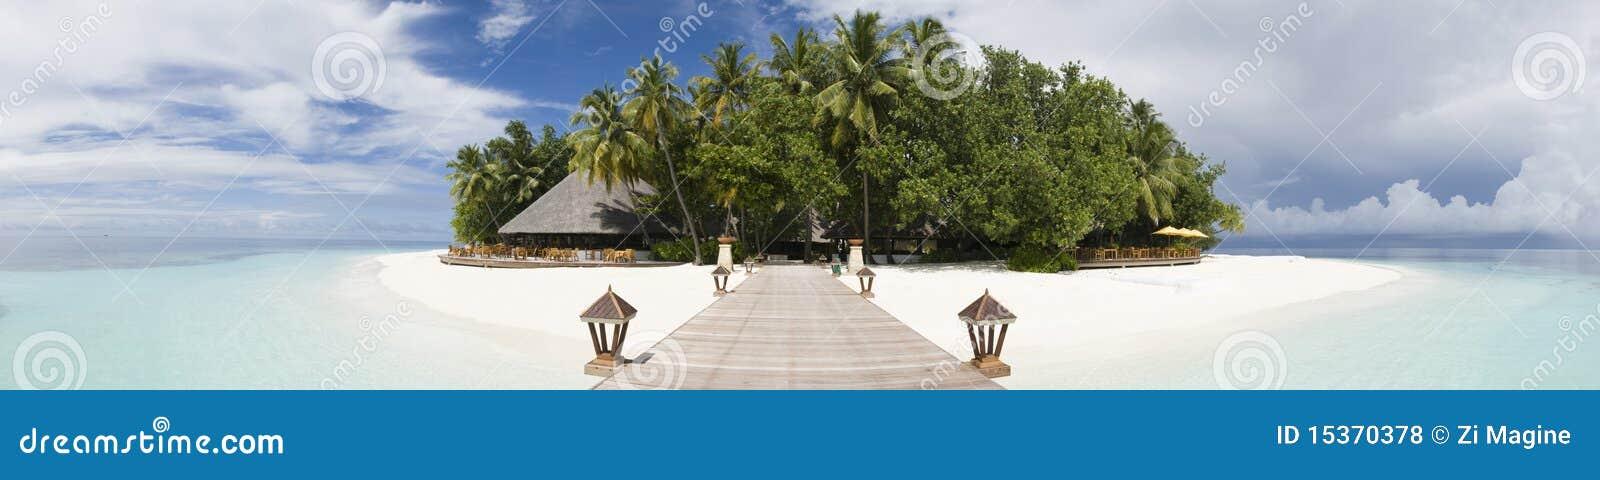 Ihuru Insel Maldives panoramisch